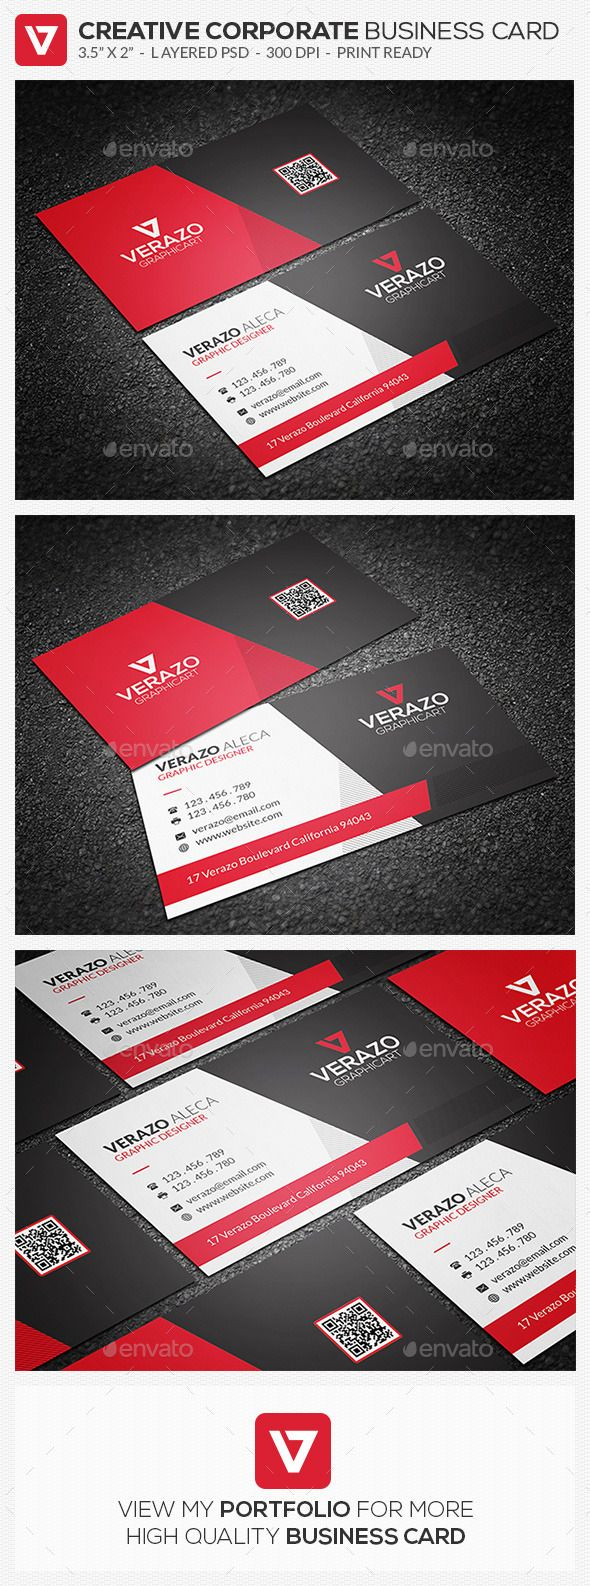 Creative Sleek Corporate Business Card 67 Corporate Business Card Business Cards Creative Buy Business Cards